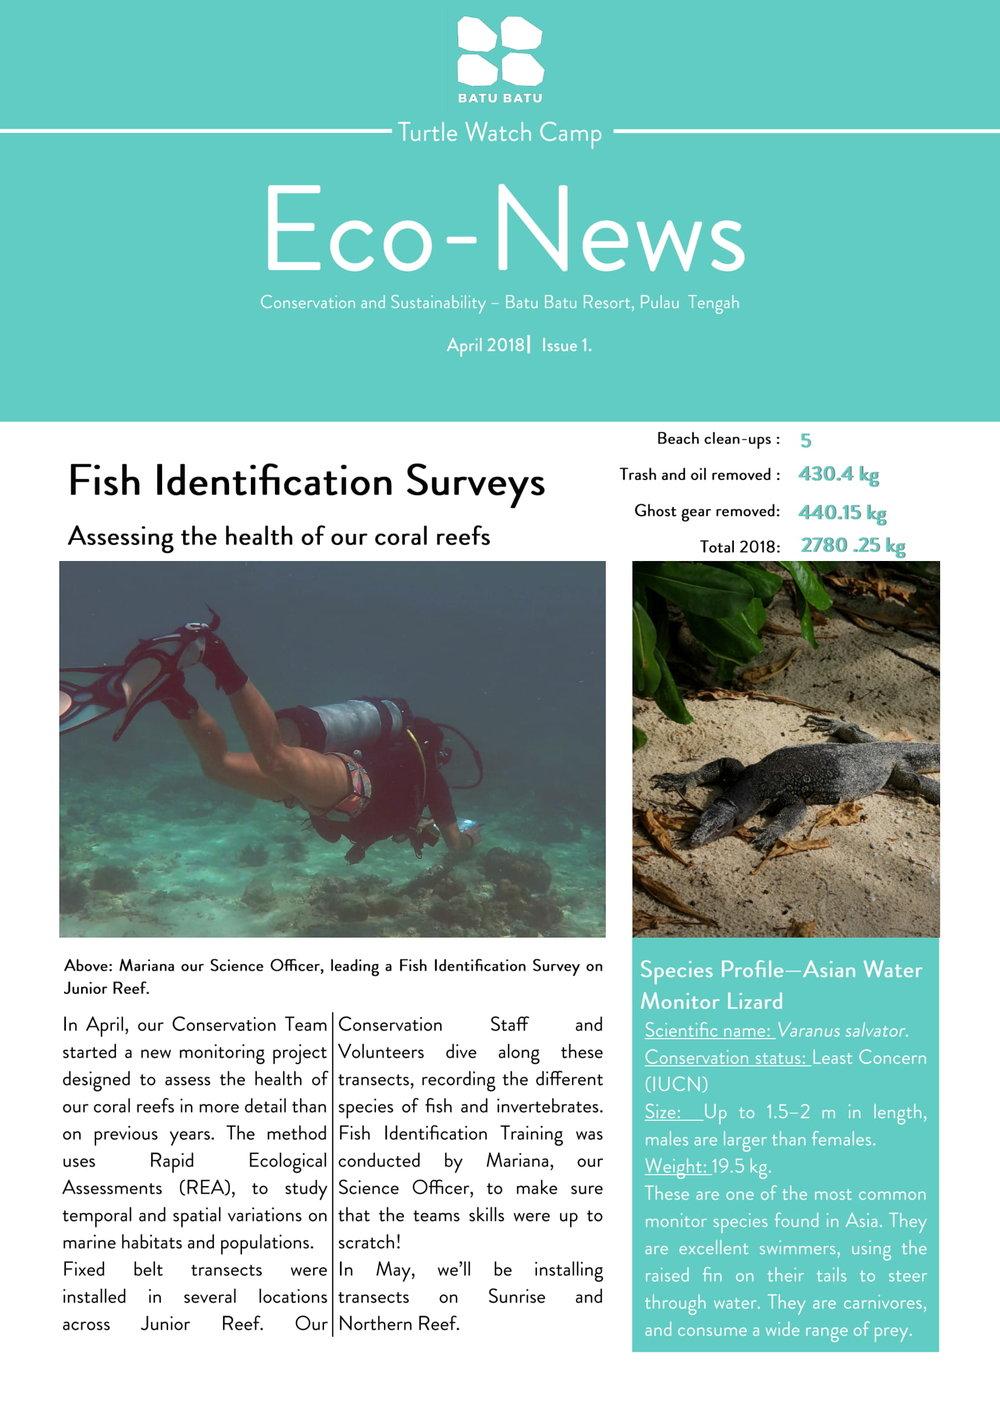 Eco-News April 2018-1.jpg